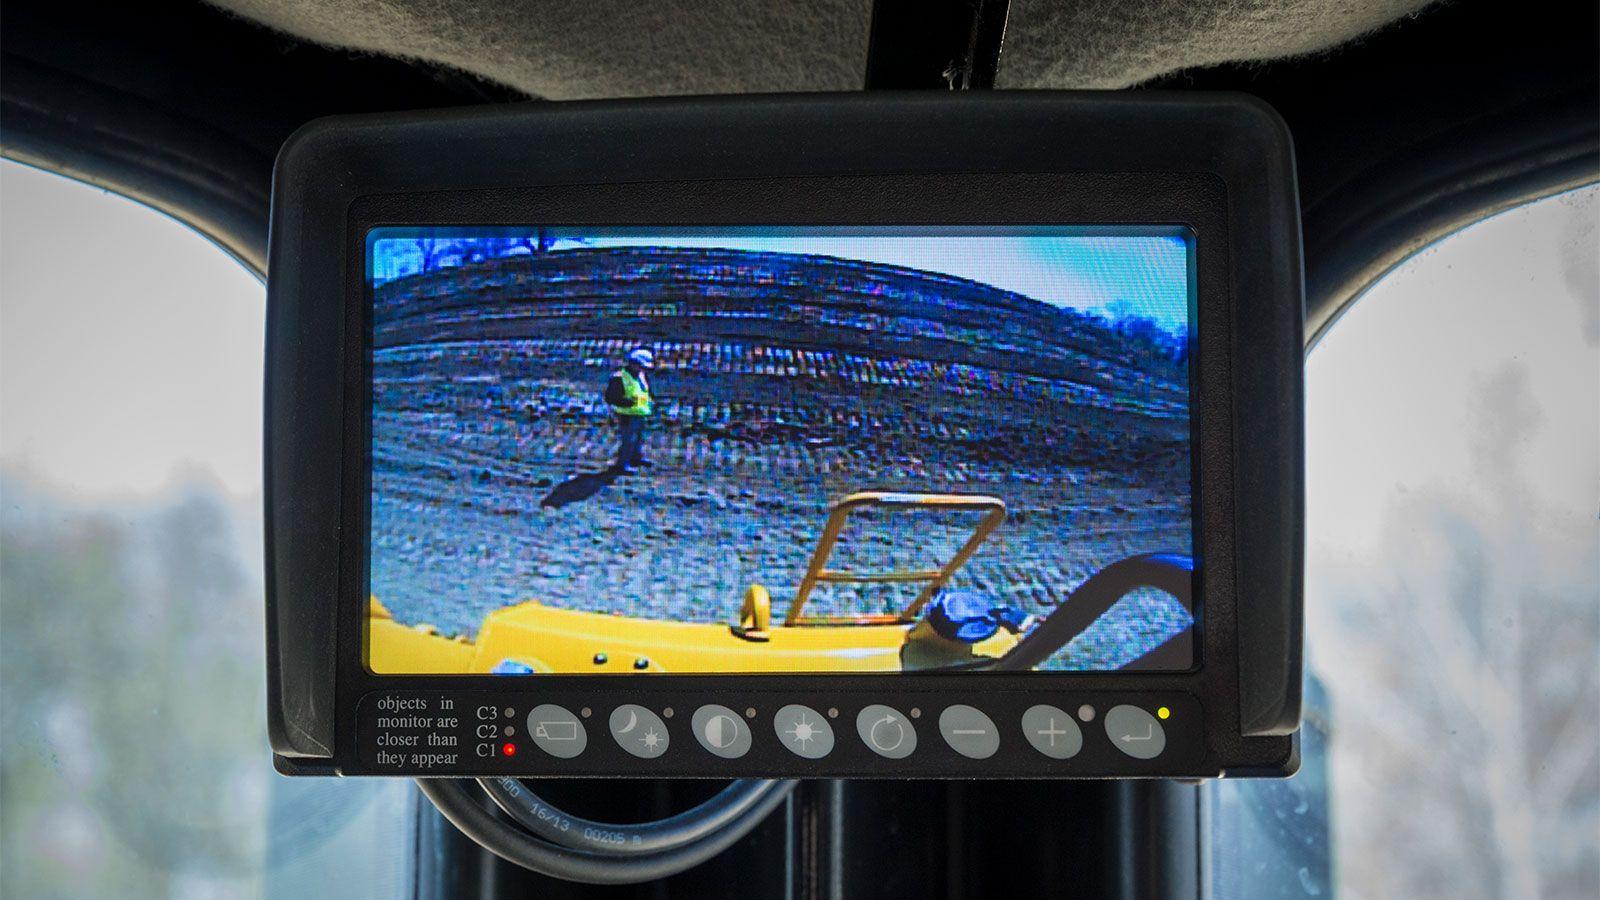 Work Area Vision System (WAVS) upgrade